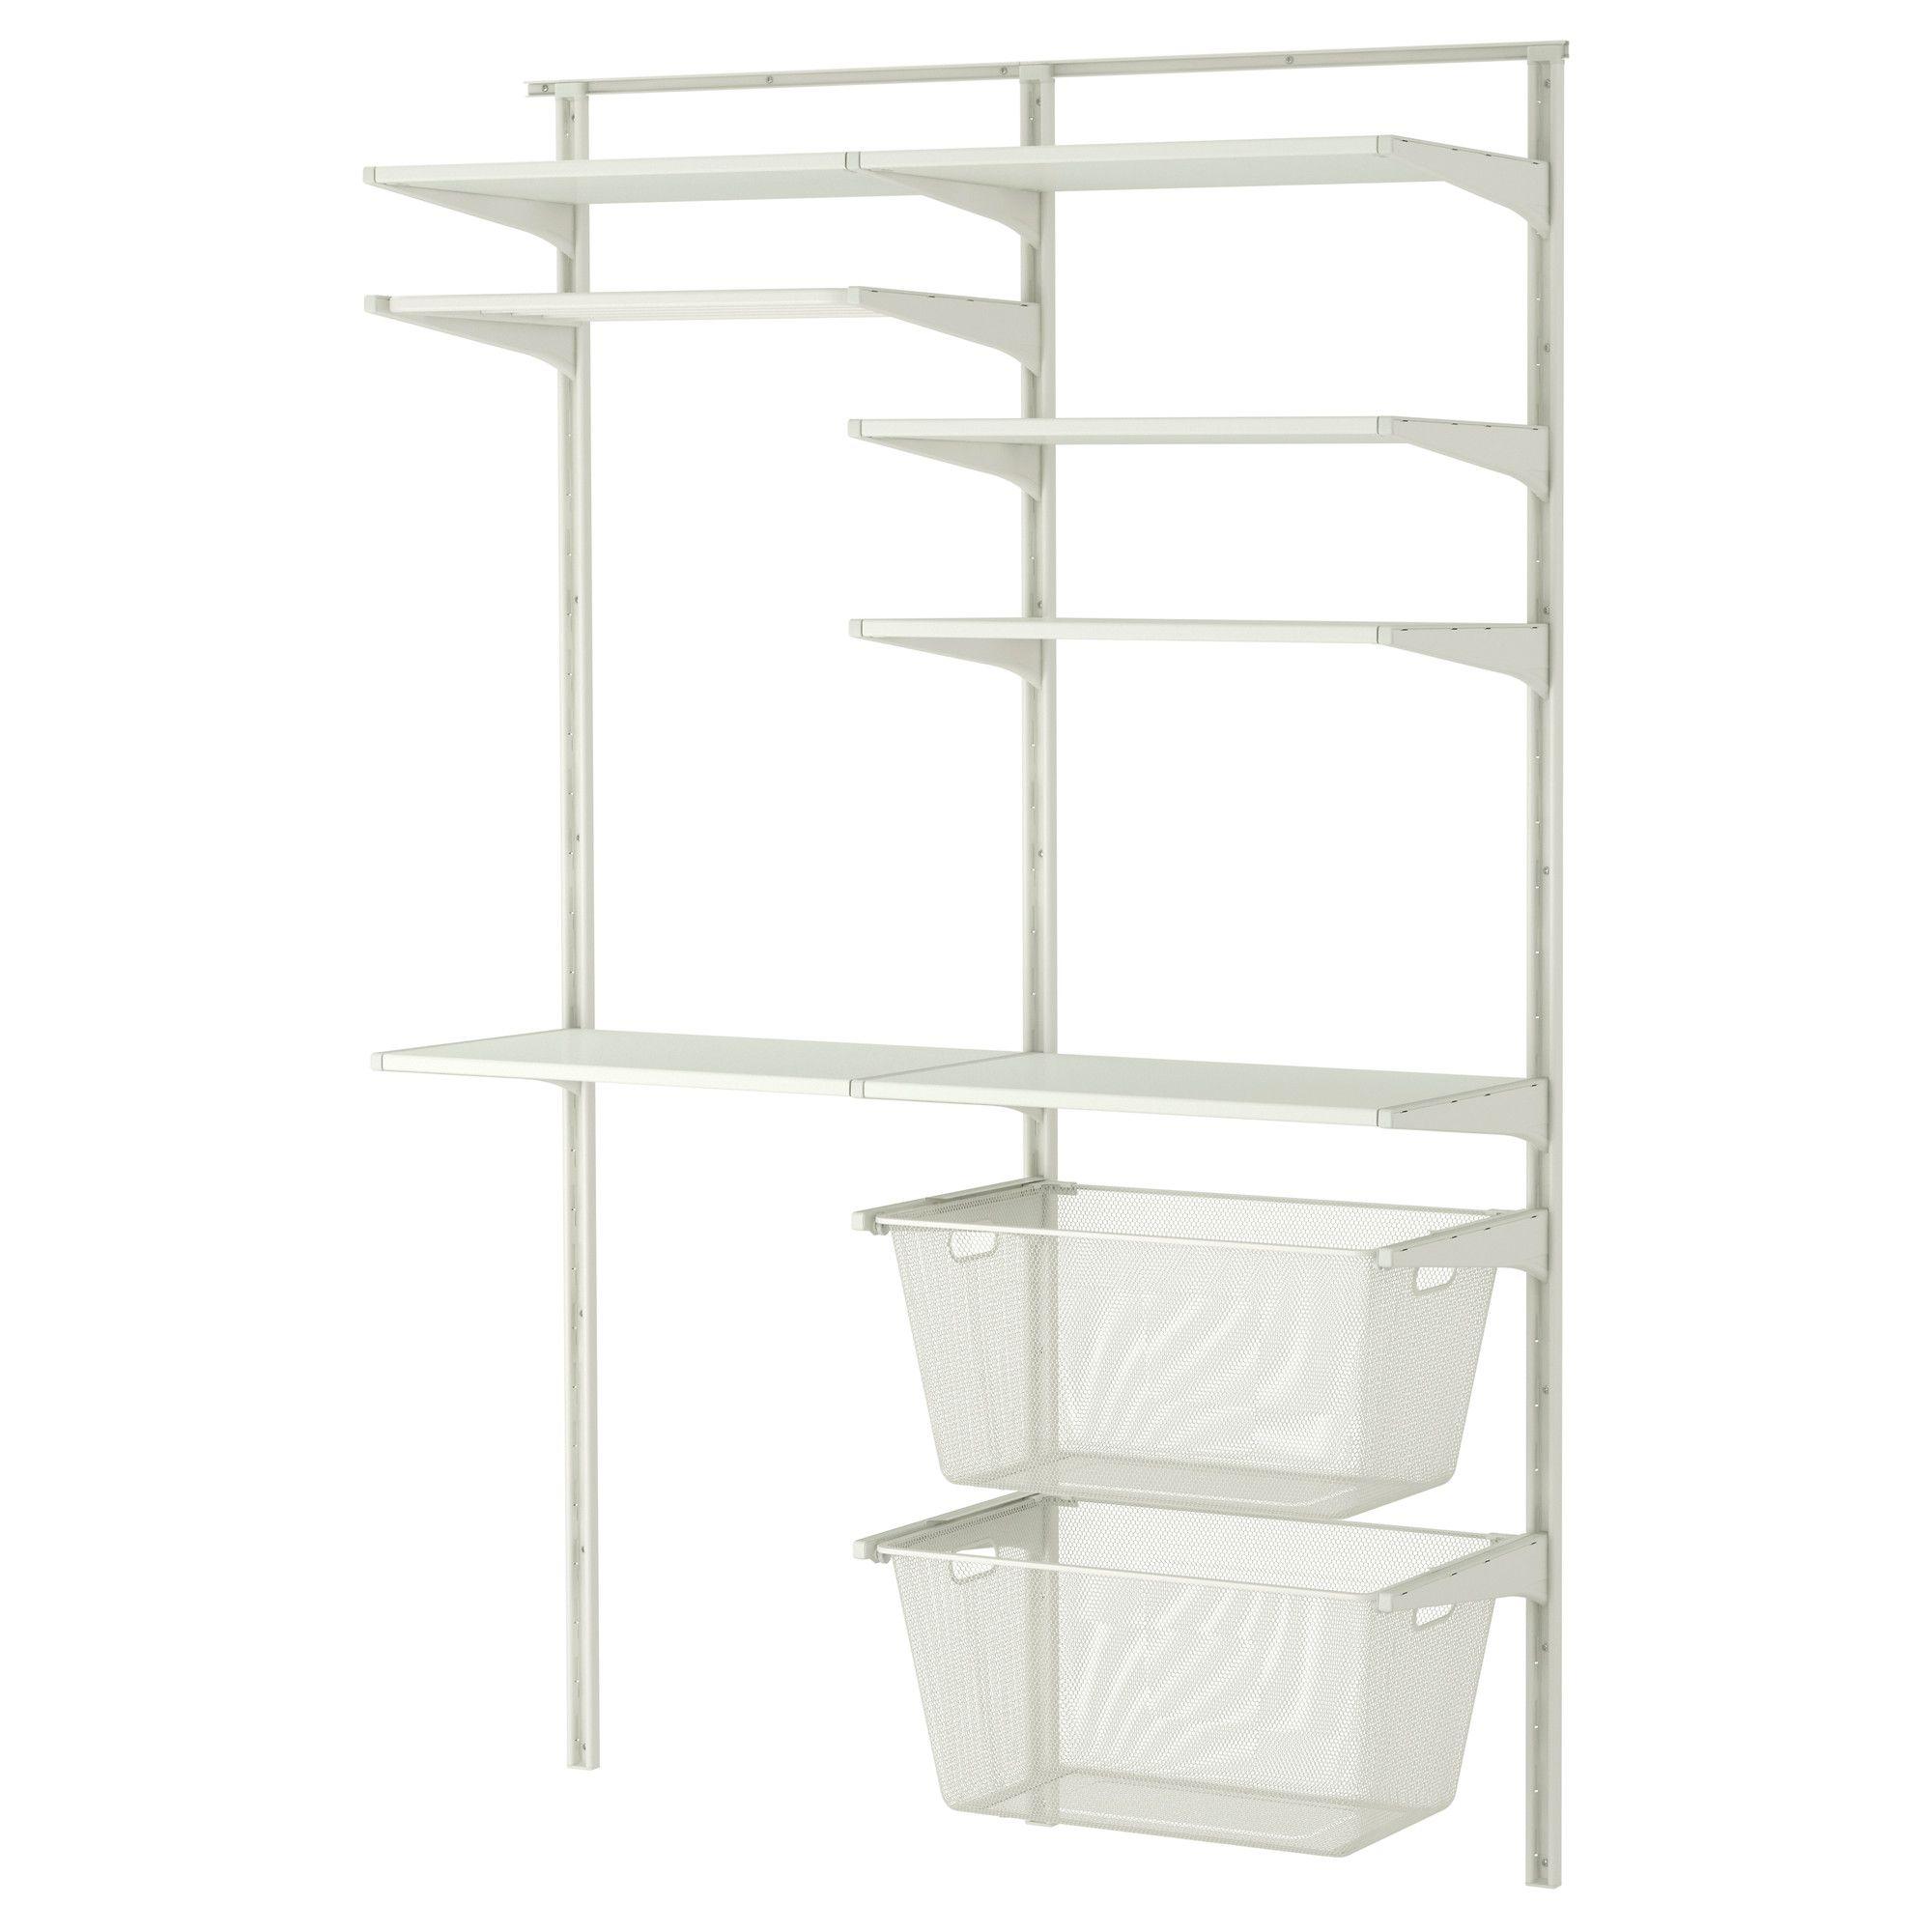 algot wall upright shelves drying rack white 132x41x199 cm. Black Bedroom Furniture Sets. Home Design Ideas